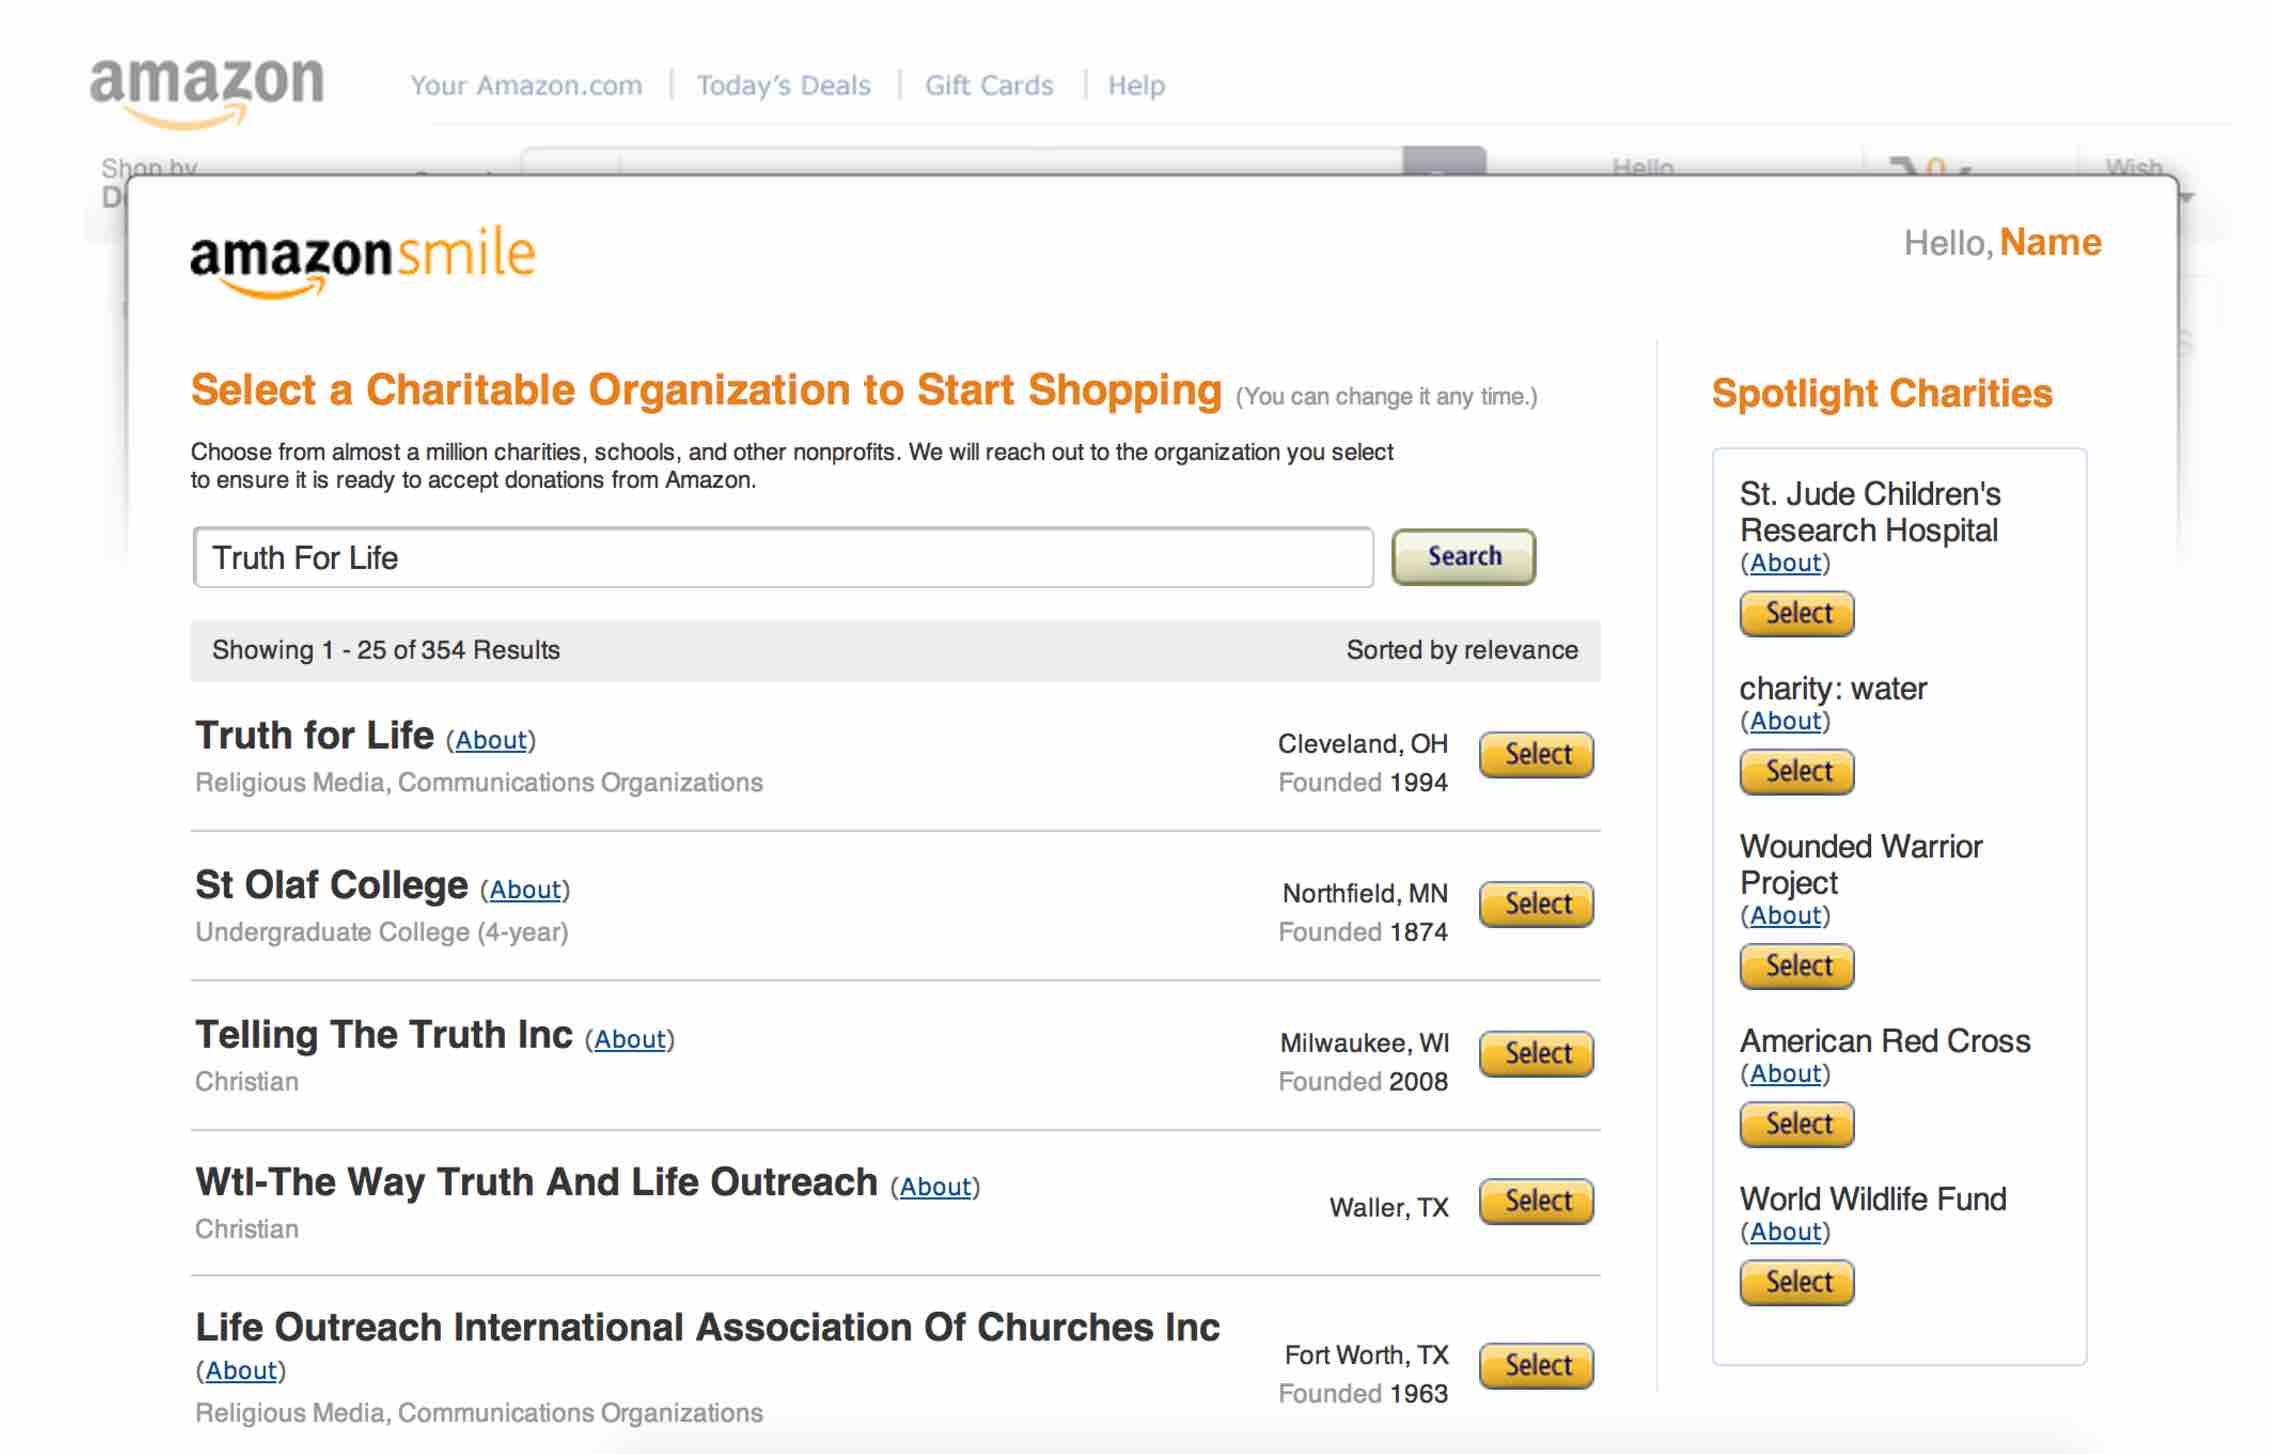 Amazon_Smile_step_3.jpg